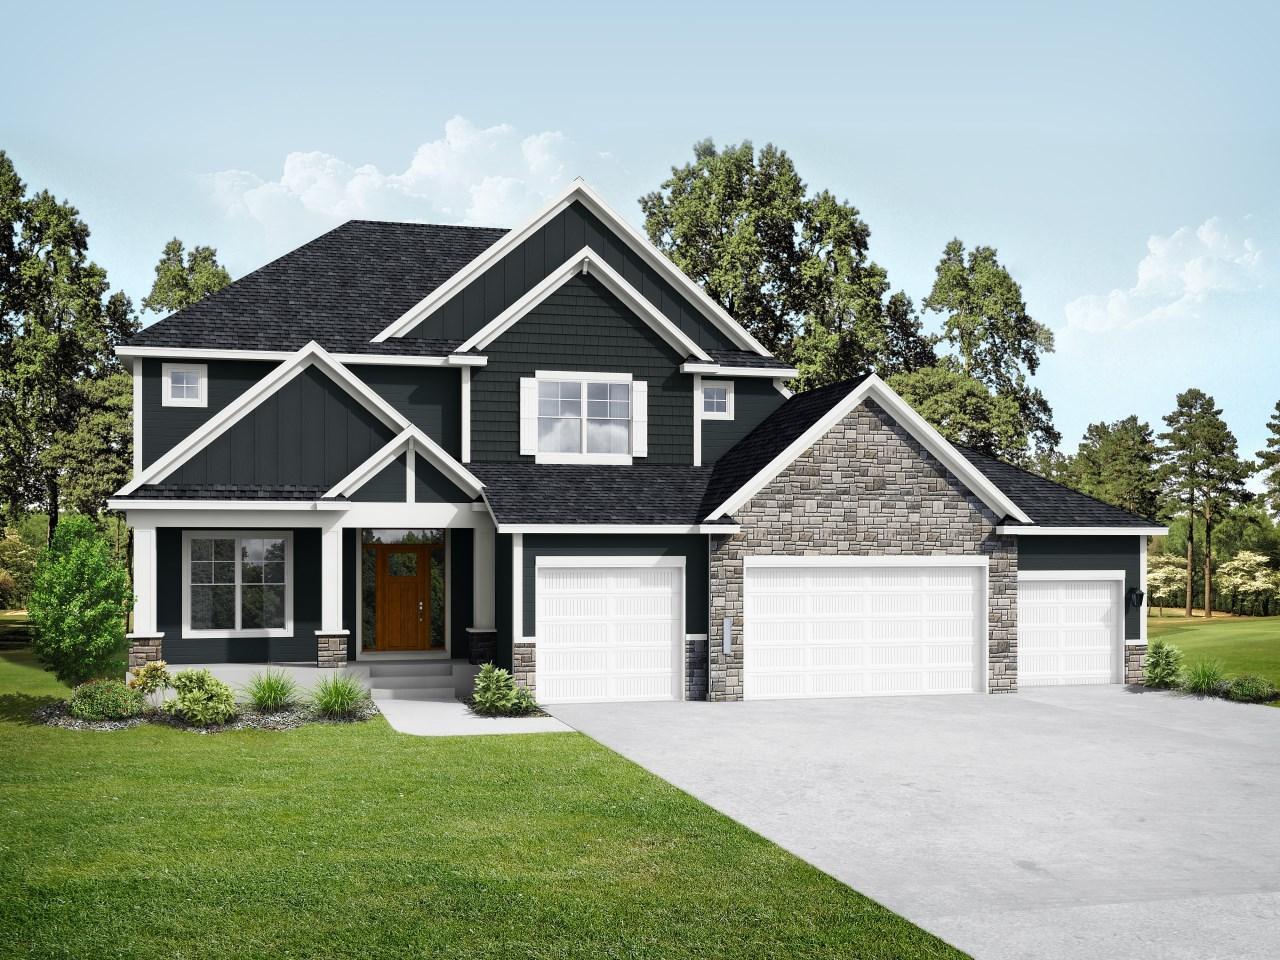 12910 137th Avenue N Property Photo - Dayton, MN real estate listing